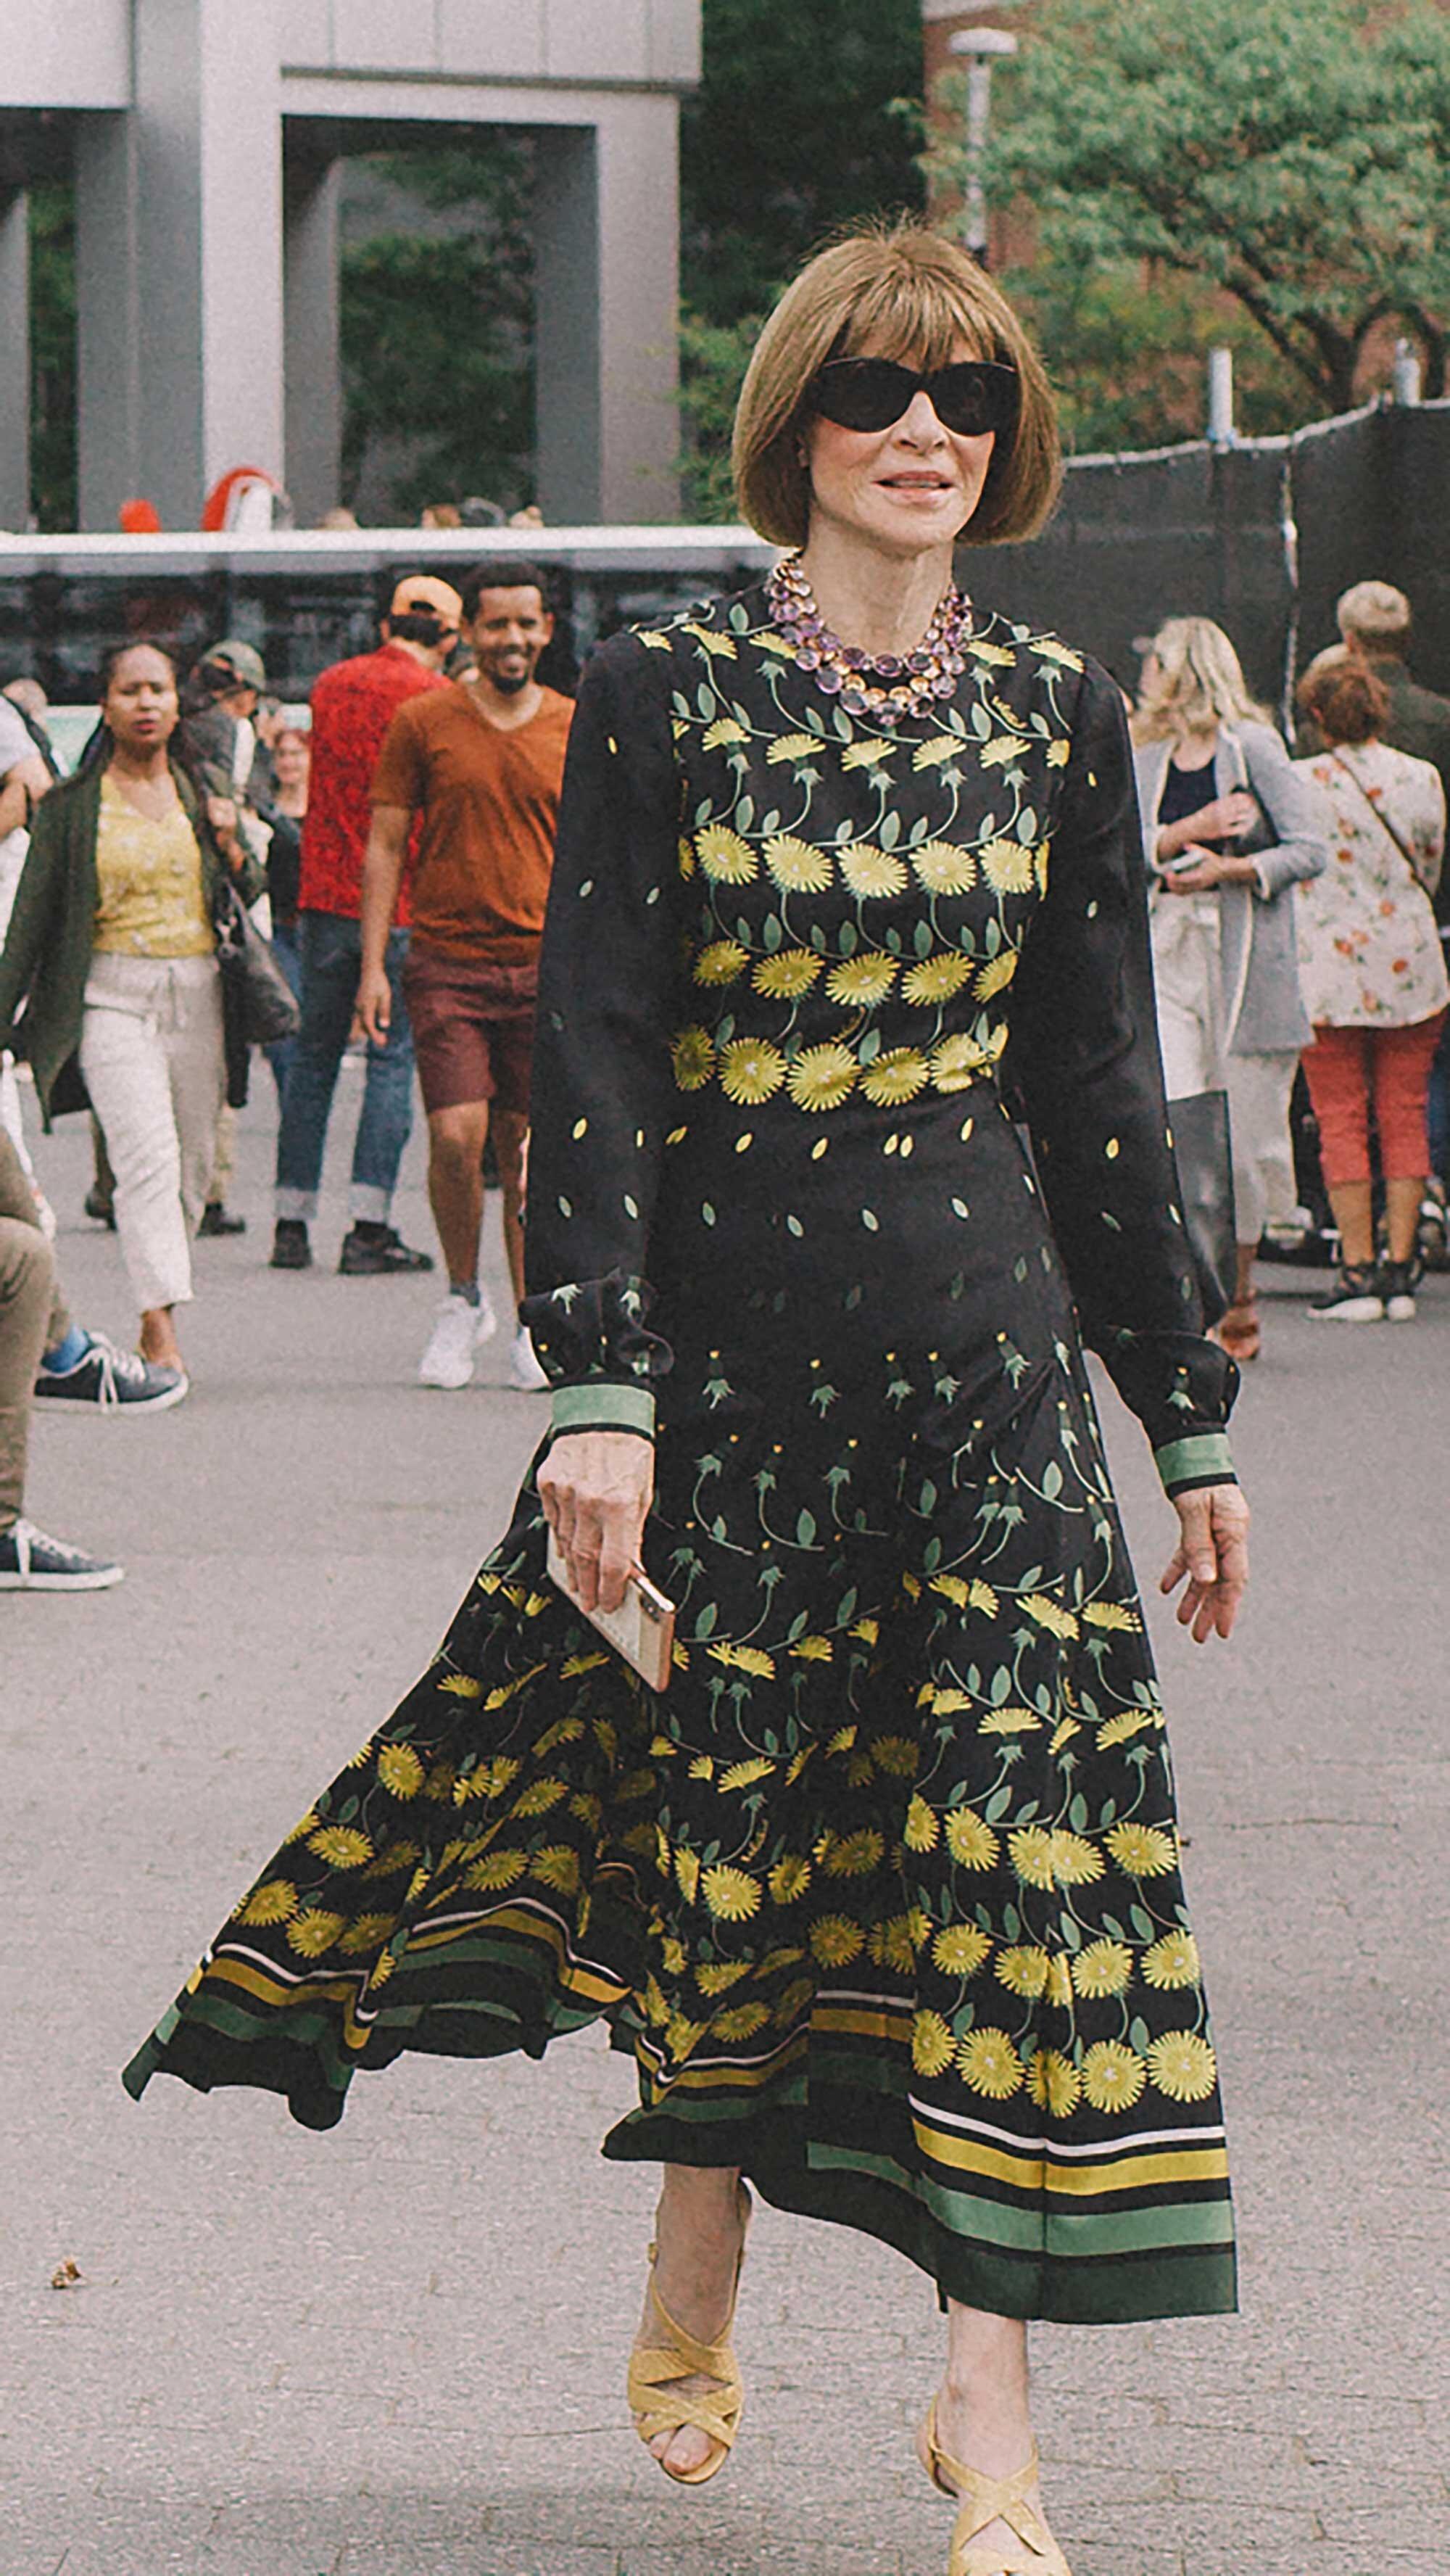 Click for more looks! Best outfits of New York Fashion Week street style 2019 Day Three Photo by @J2martinez Jose J. Martinez www.jmrtnz.com -16.jpg